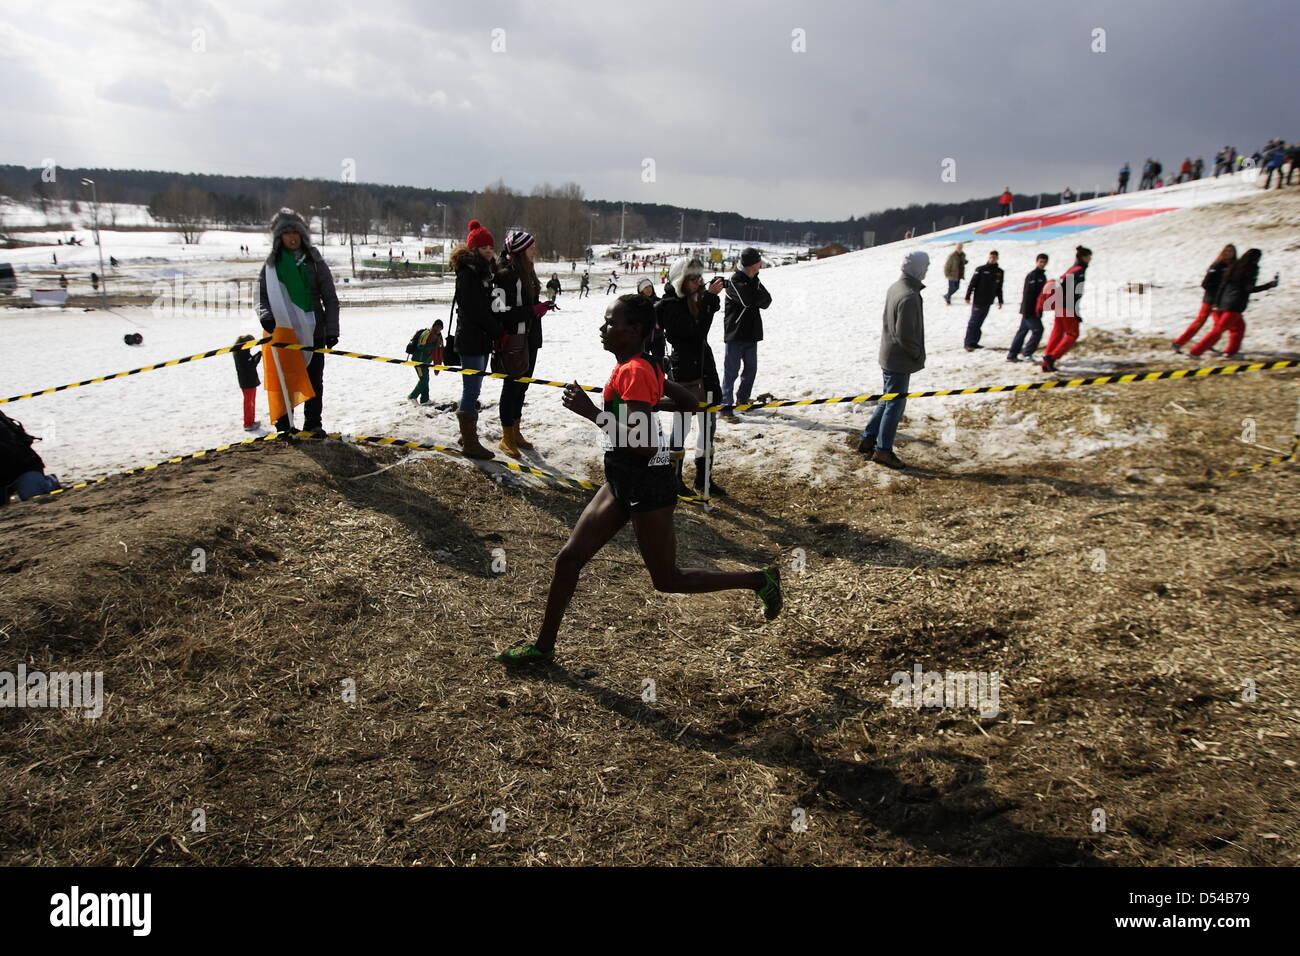 Bydgoszcz, Poland 24th, March 2013 IAAF World Cross Country Chamiponships. Senior Race Woman. - Stock Image